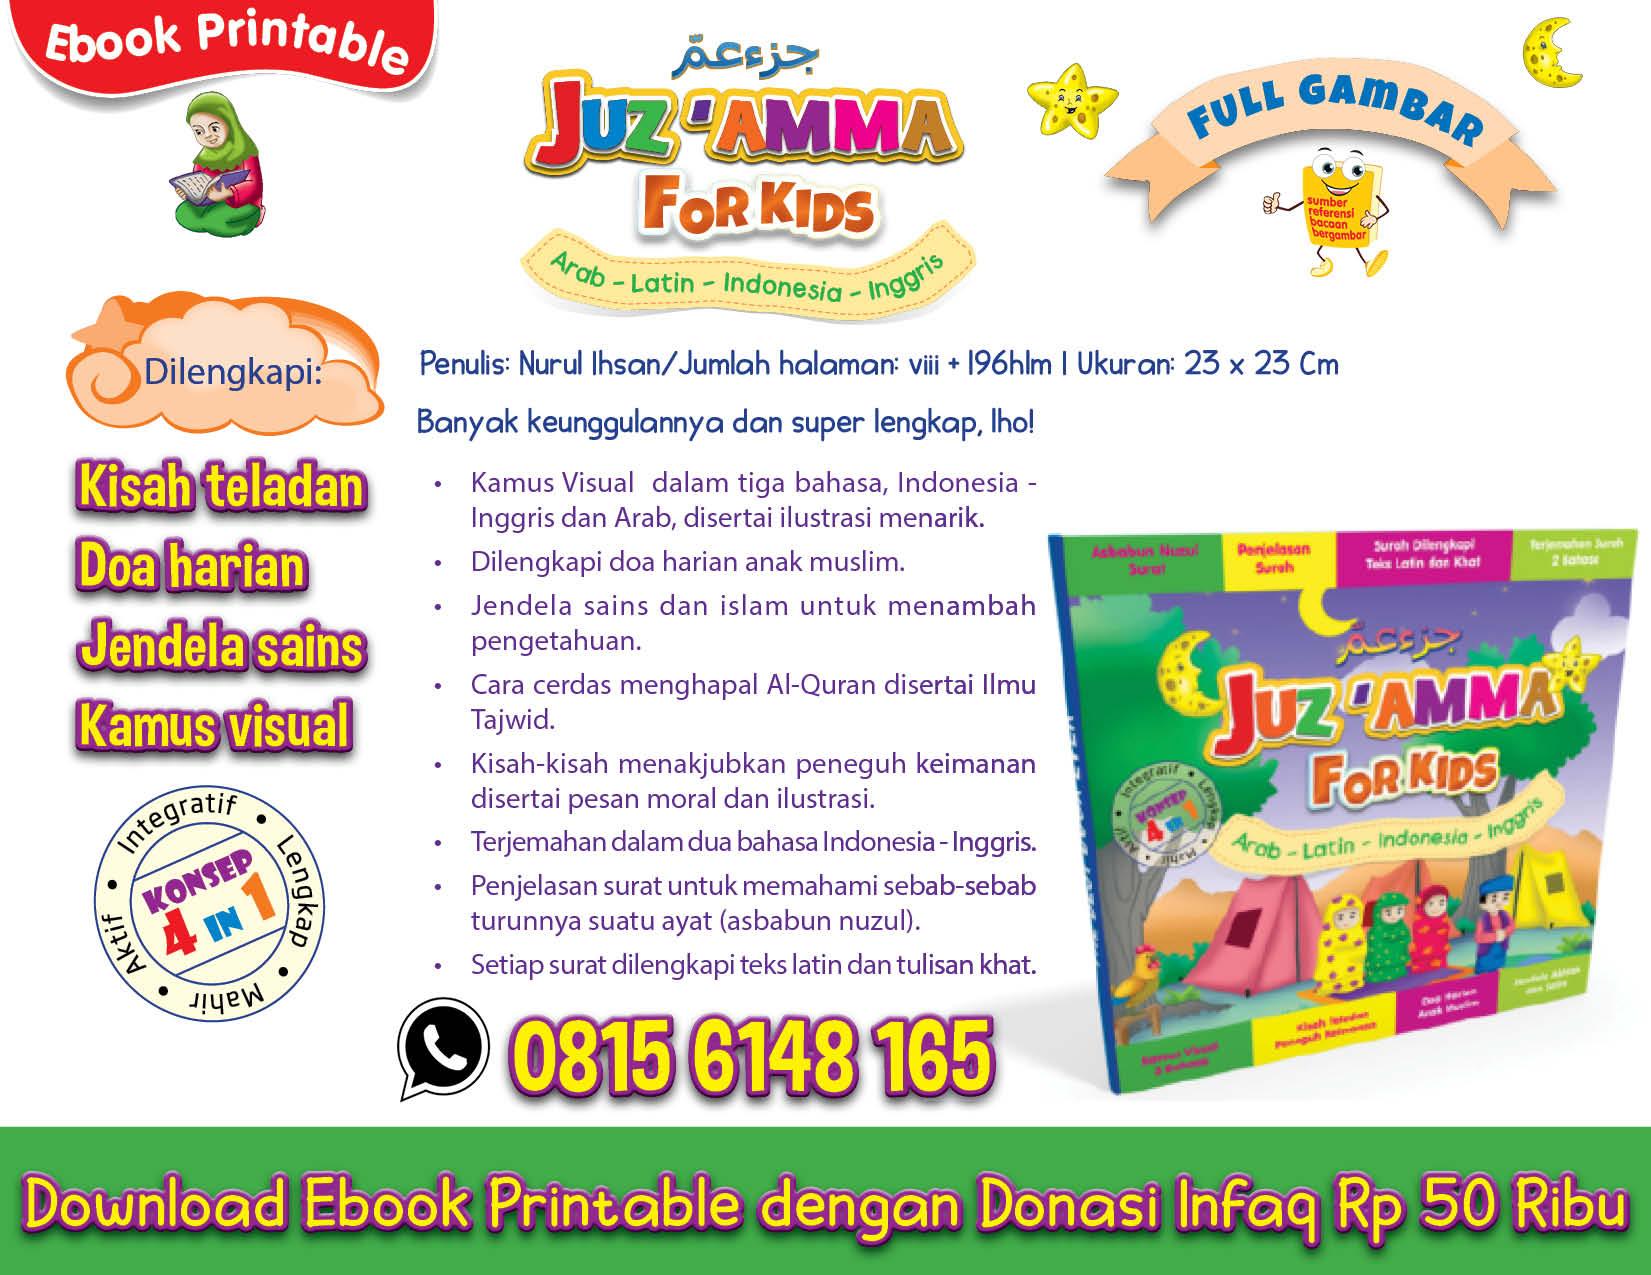 iklan printable ebook juz amma for kids